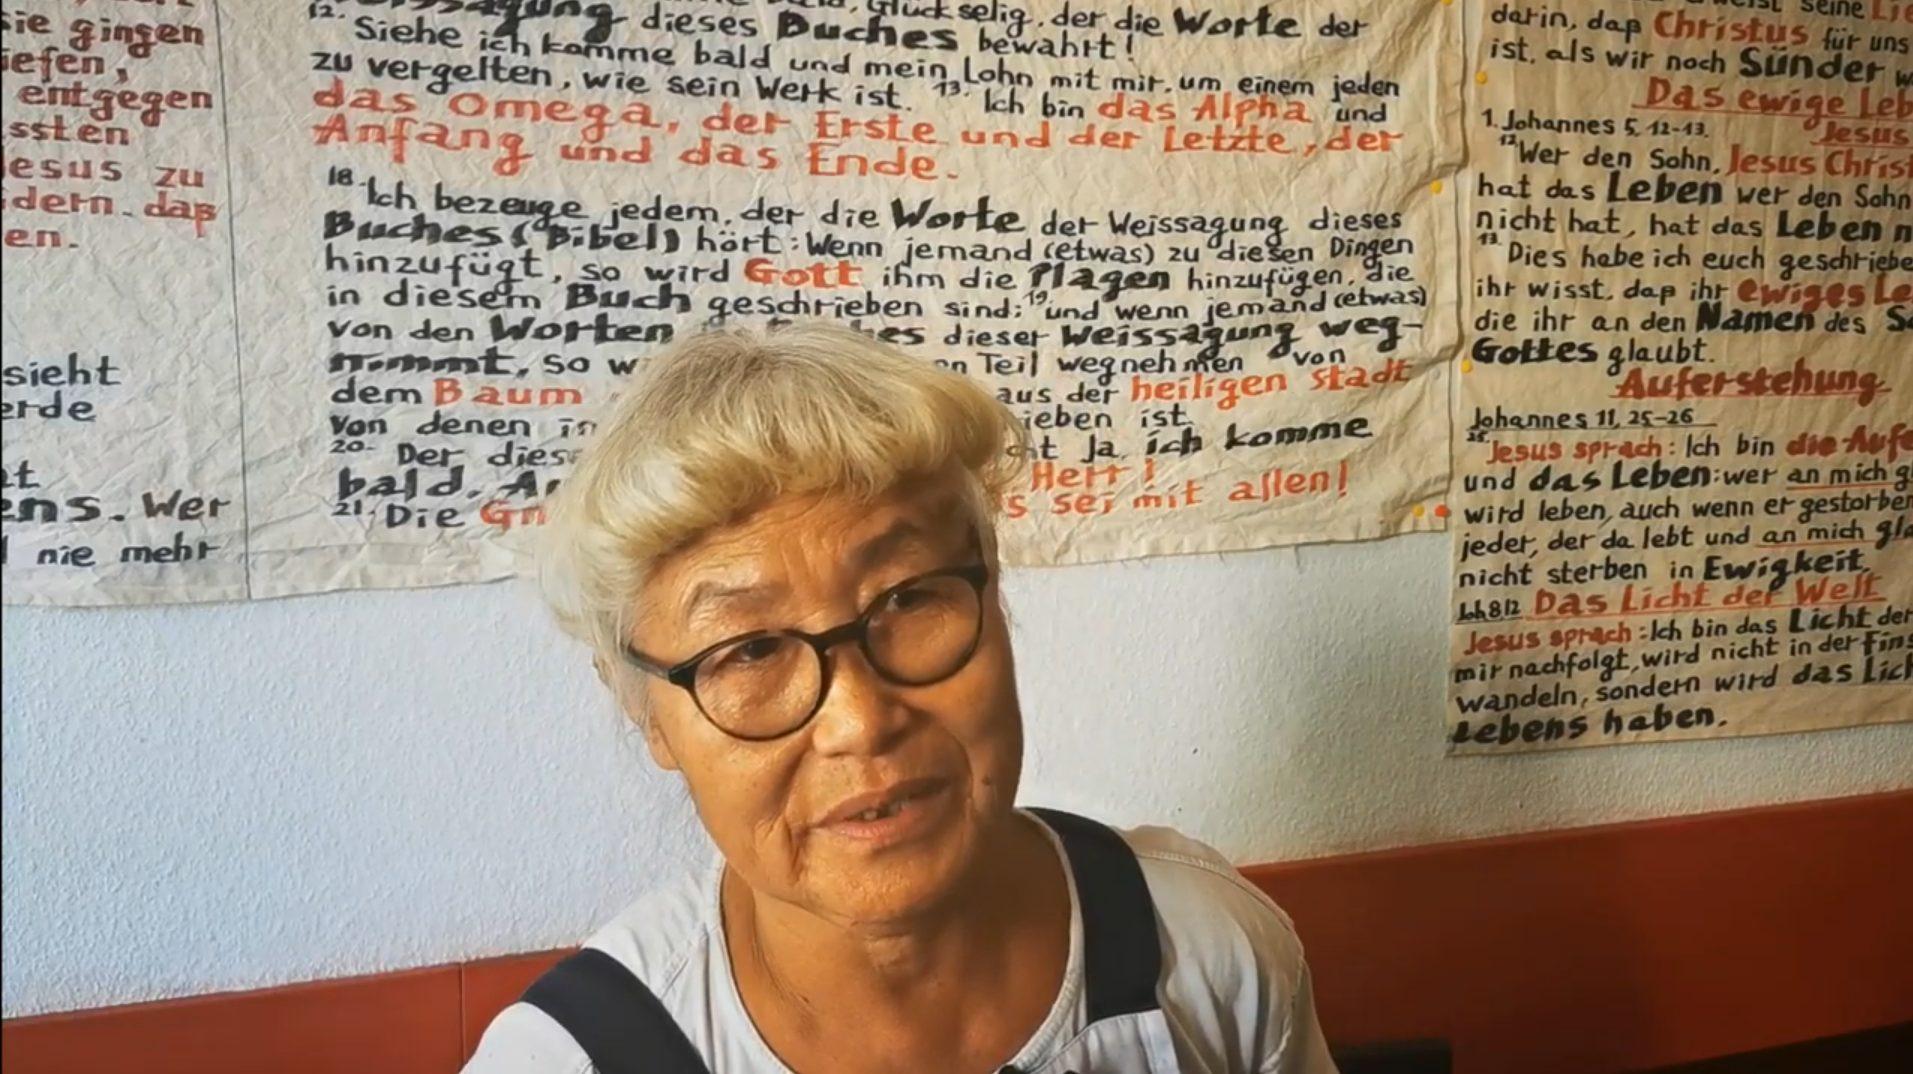 Park Young-Ai: Hat Bibelverse in Restaurant aufgehängt